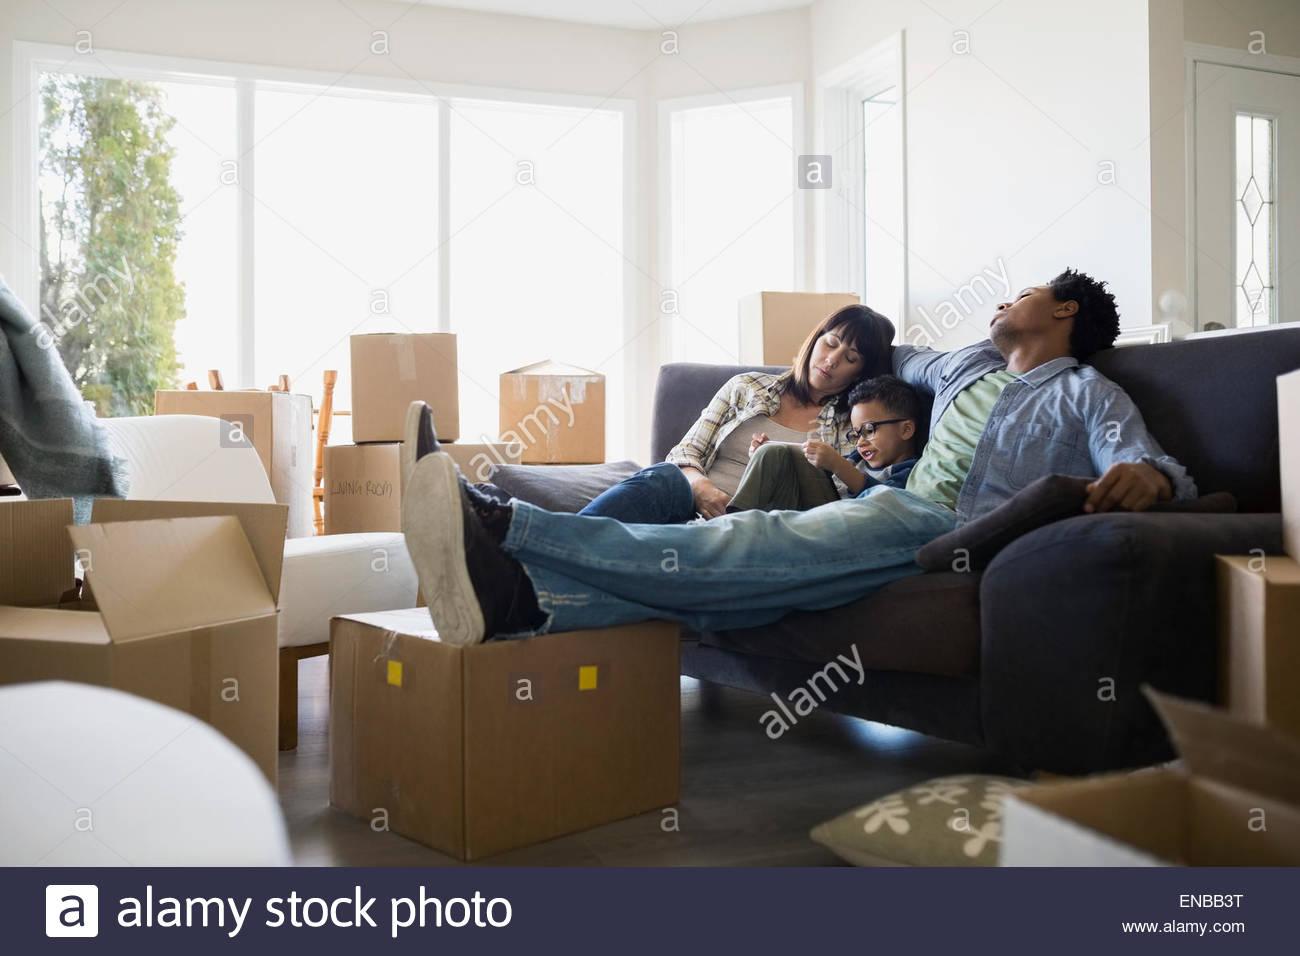 Umzugskartons rund um Familie entspannend auf sofa Stockbild